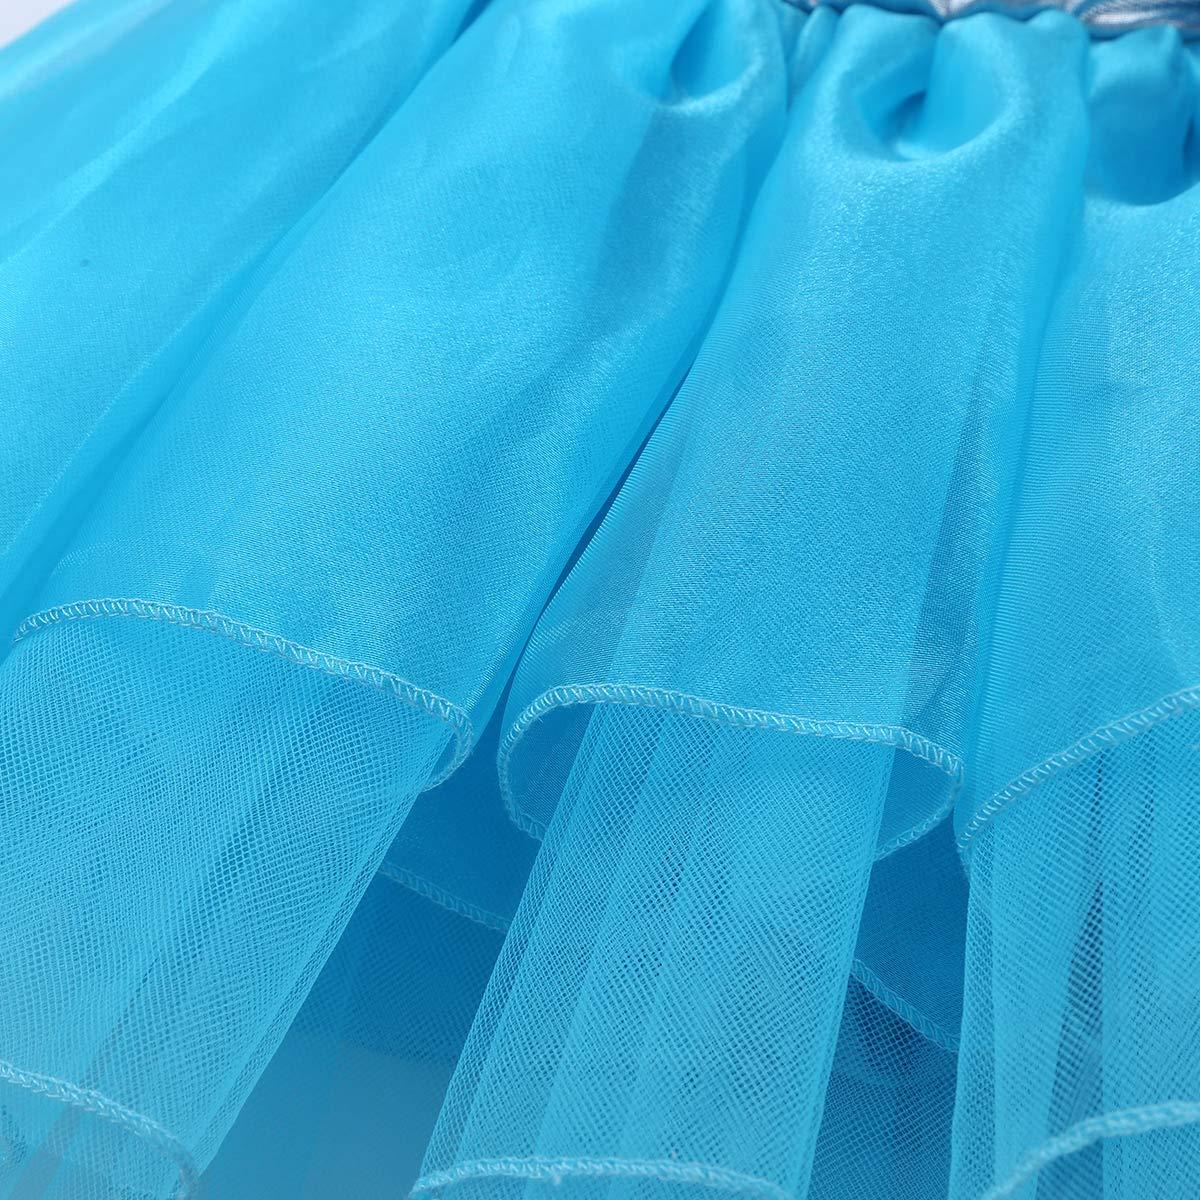 YiZYiF Kids Girls Camisole Sequined Tutu Ballet Dance Party Leotard Dress